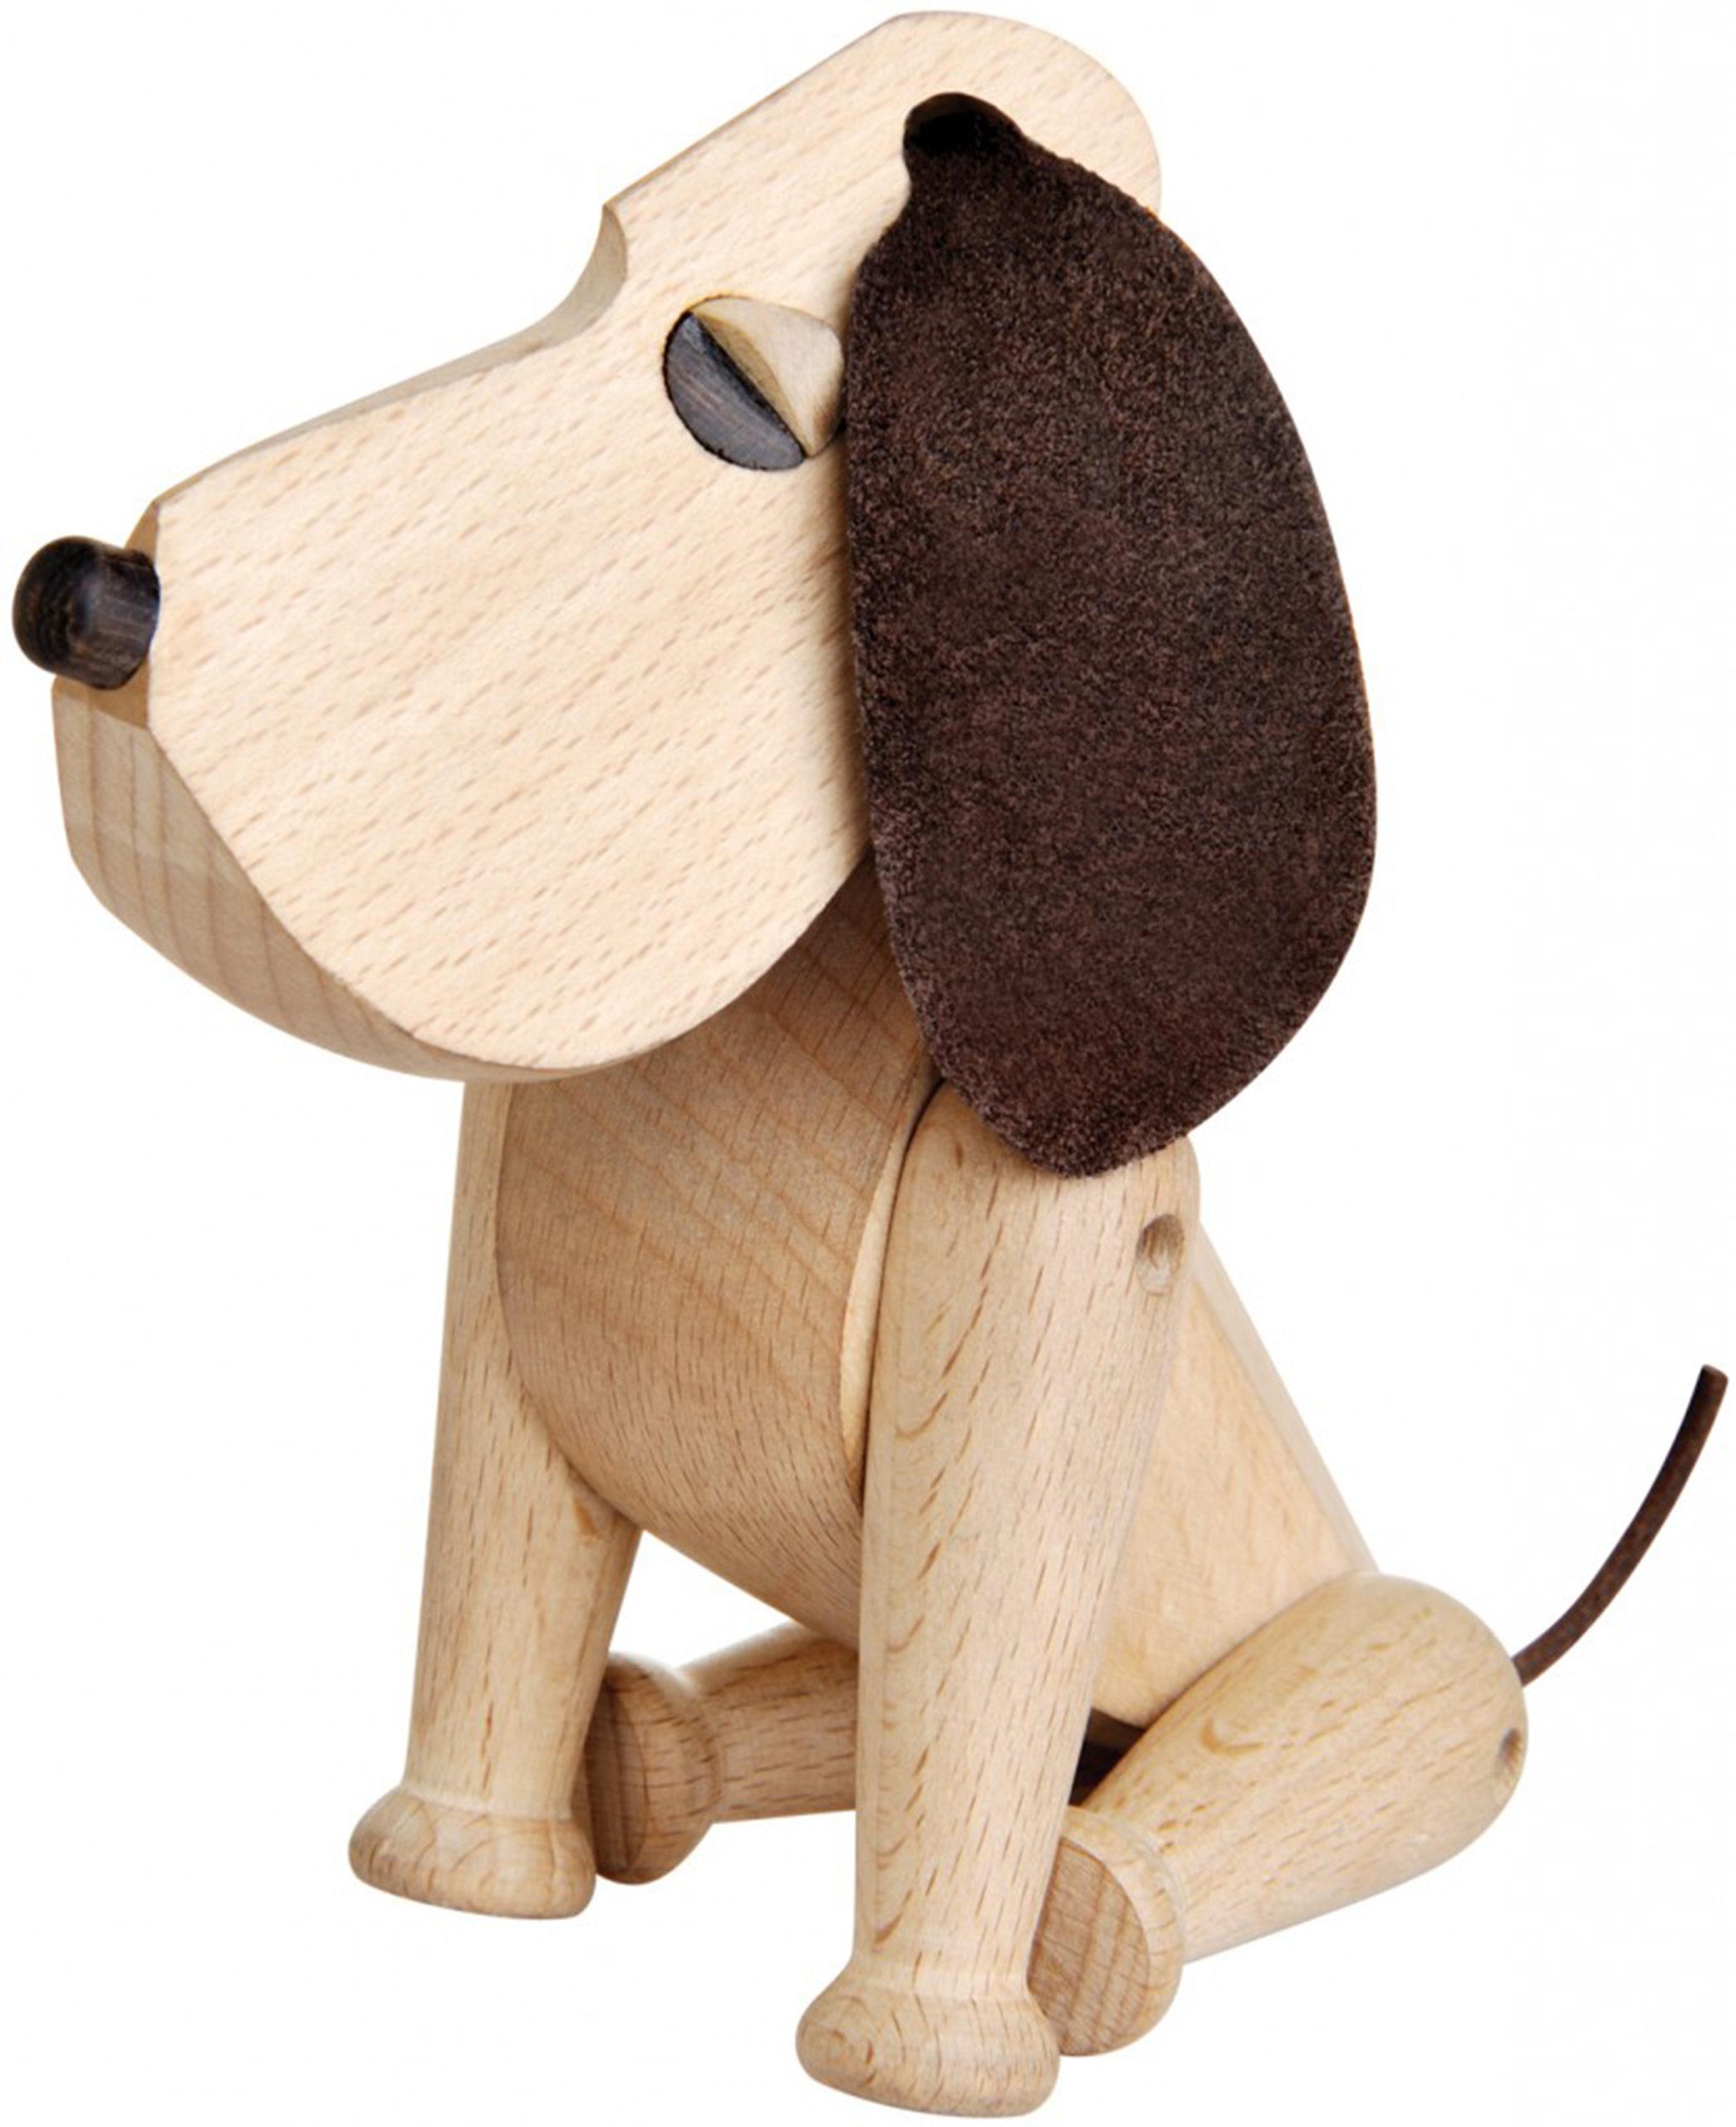 ARCHITECTMADE Oscar Dog Beech Wood Hans Bølling